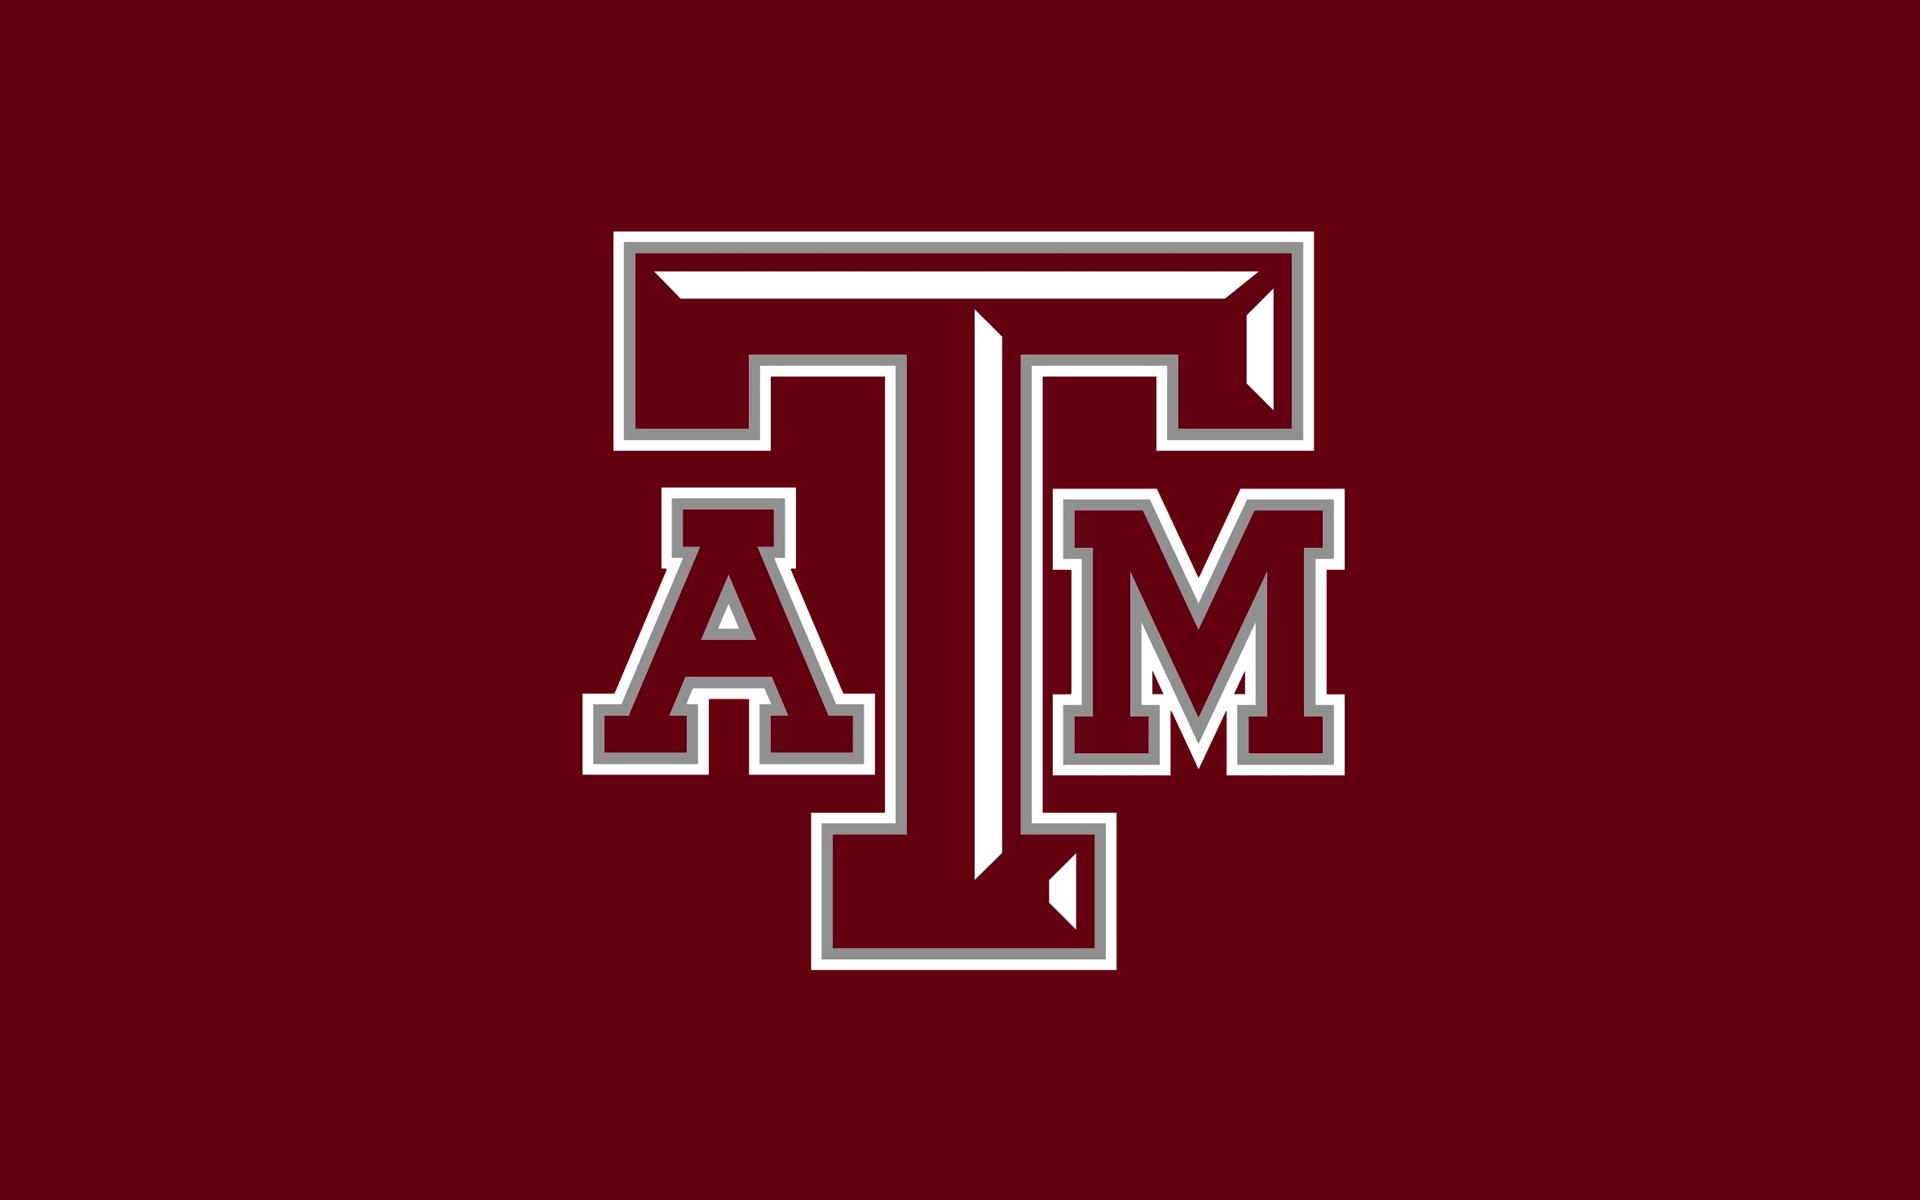 texas-am-aggies-football-wallpaper-collection-texas-longhorns-